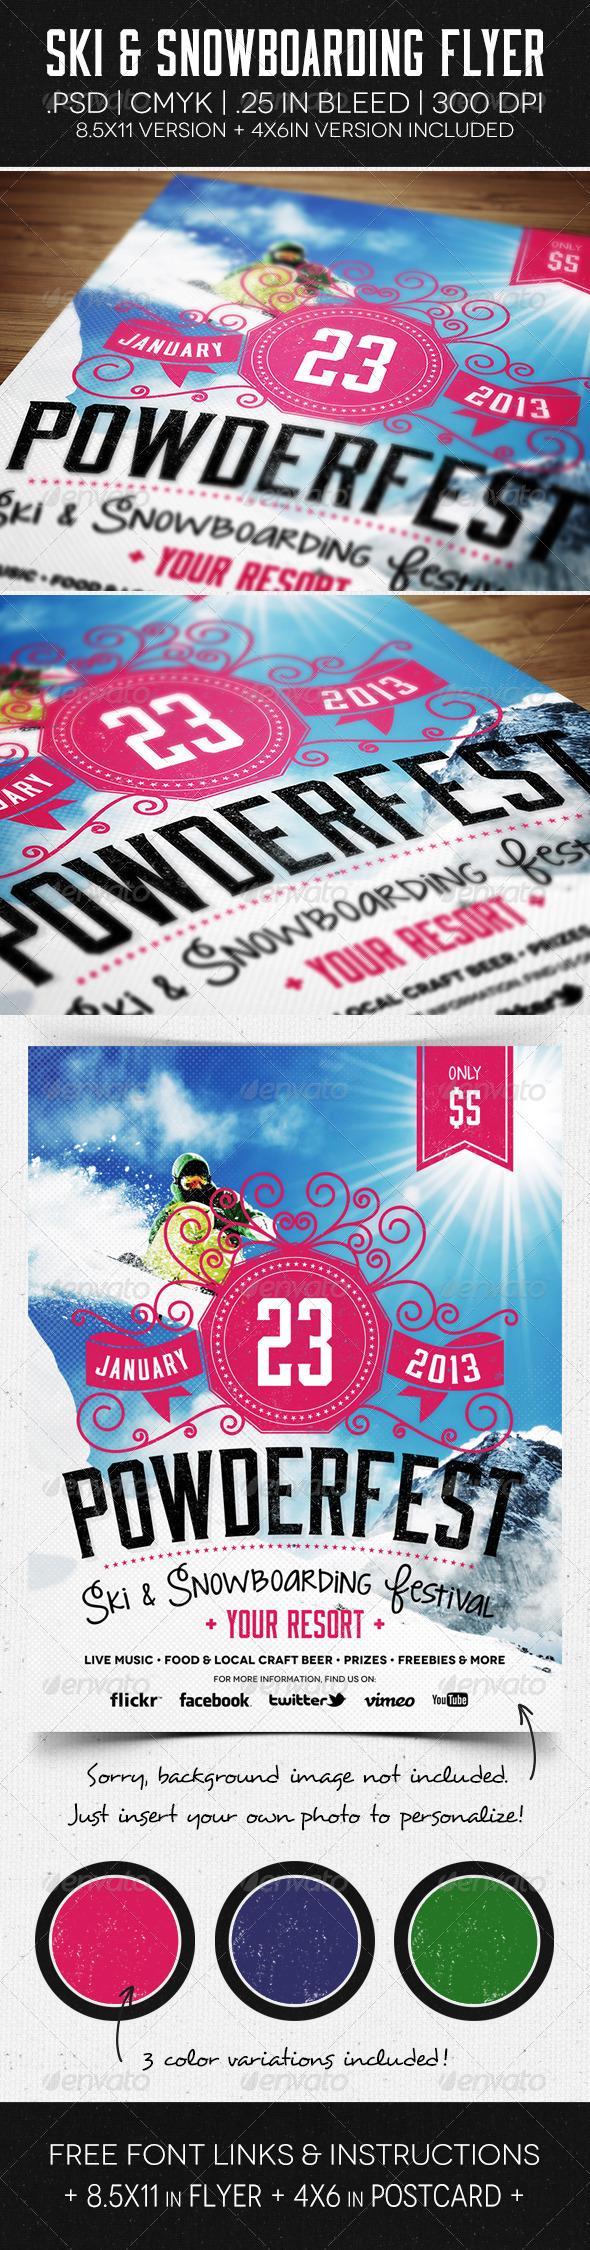 GraphicRiver Ski & Snowboard Flyer & Postcard 5892121